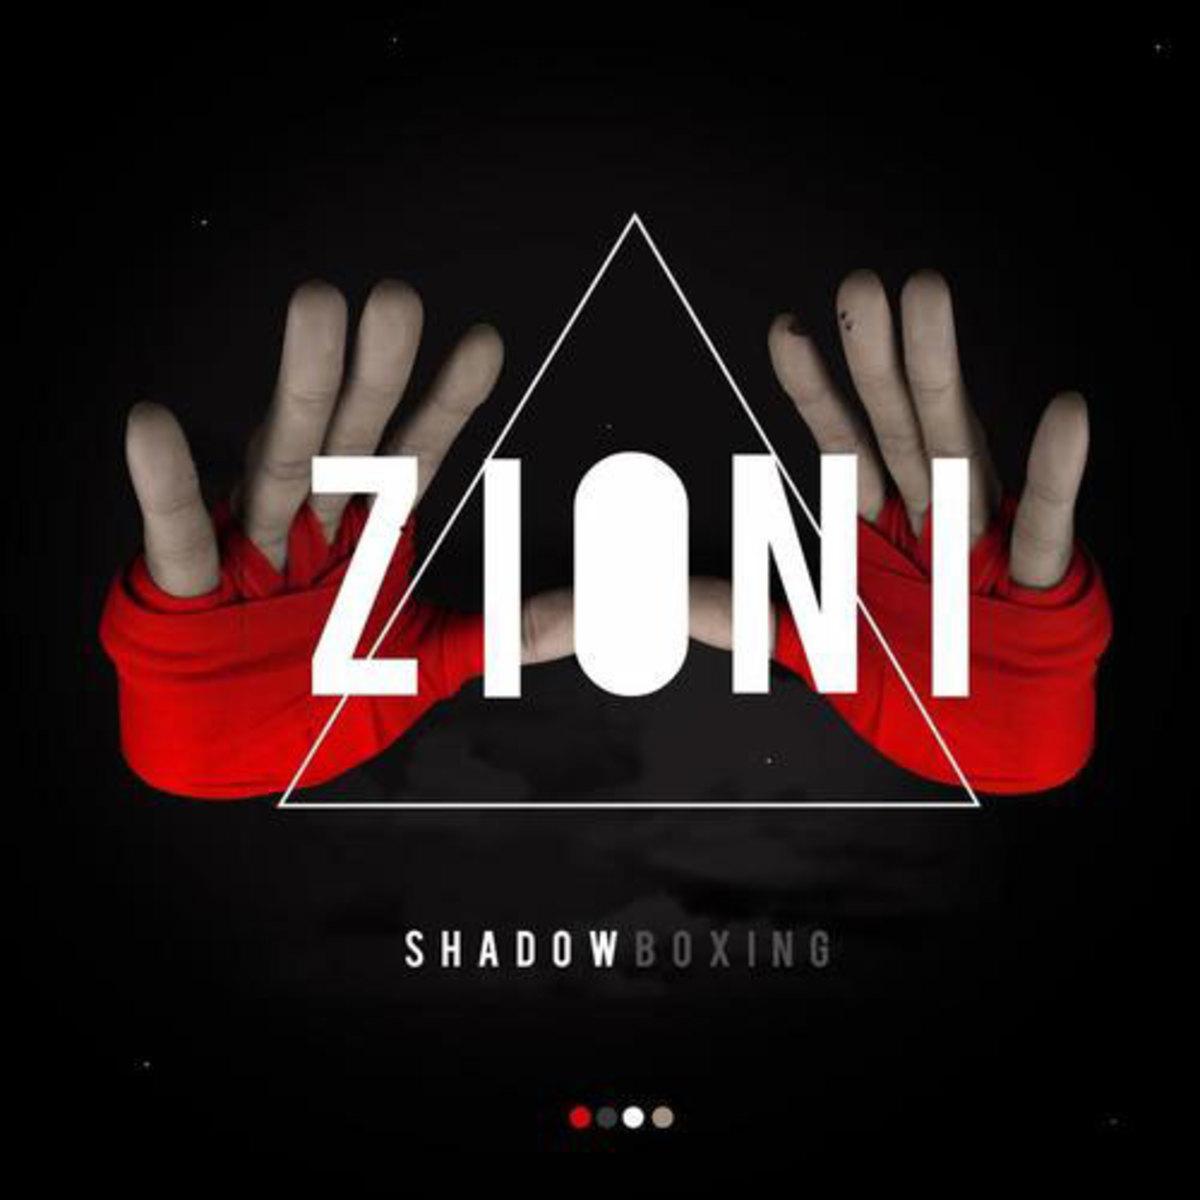 zioni-shadowboxing.jpg